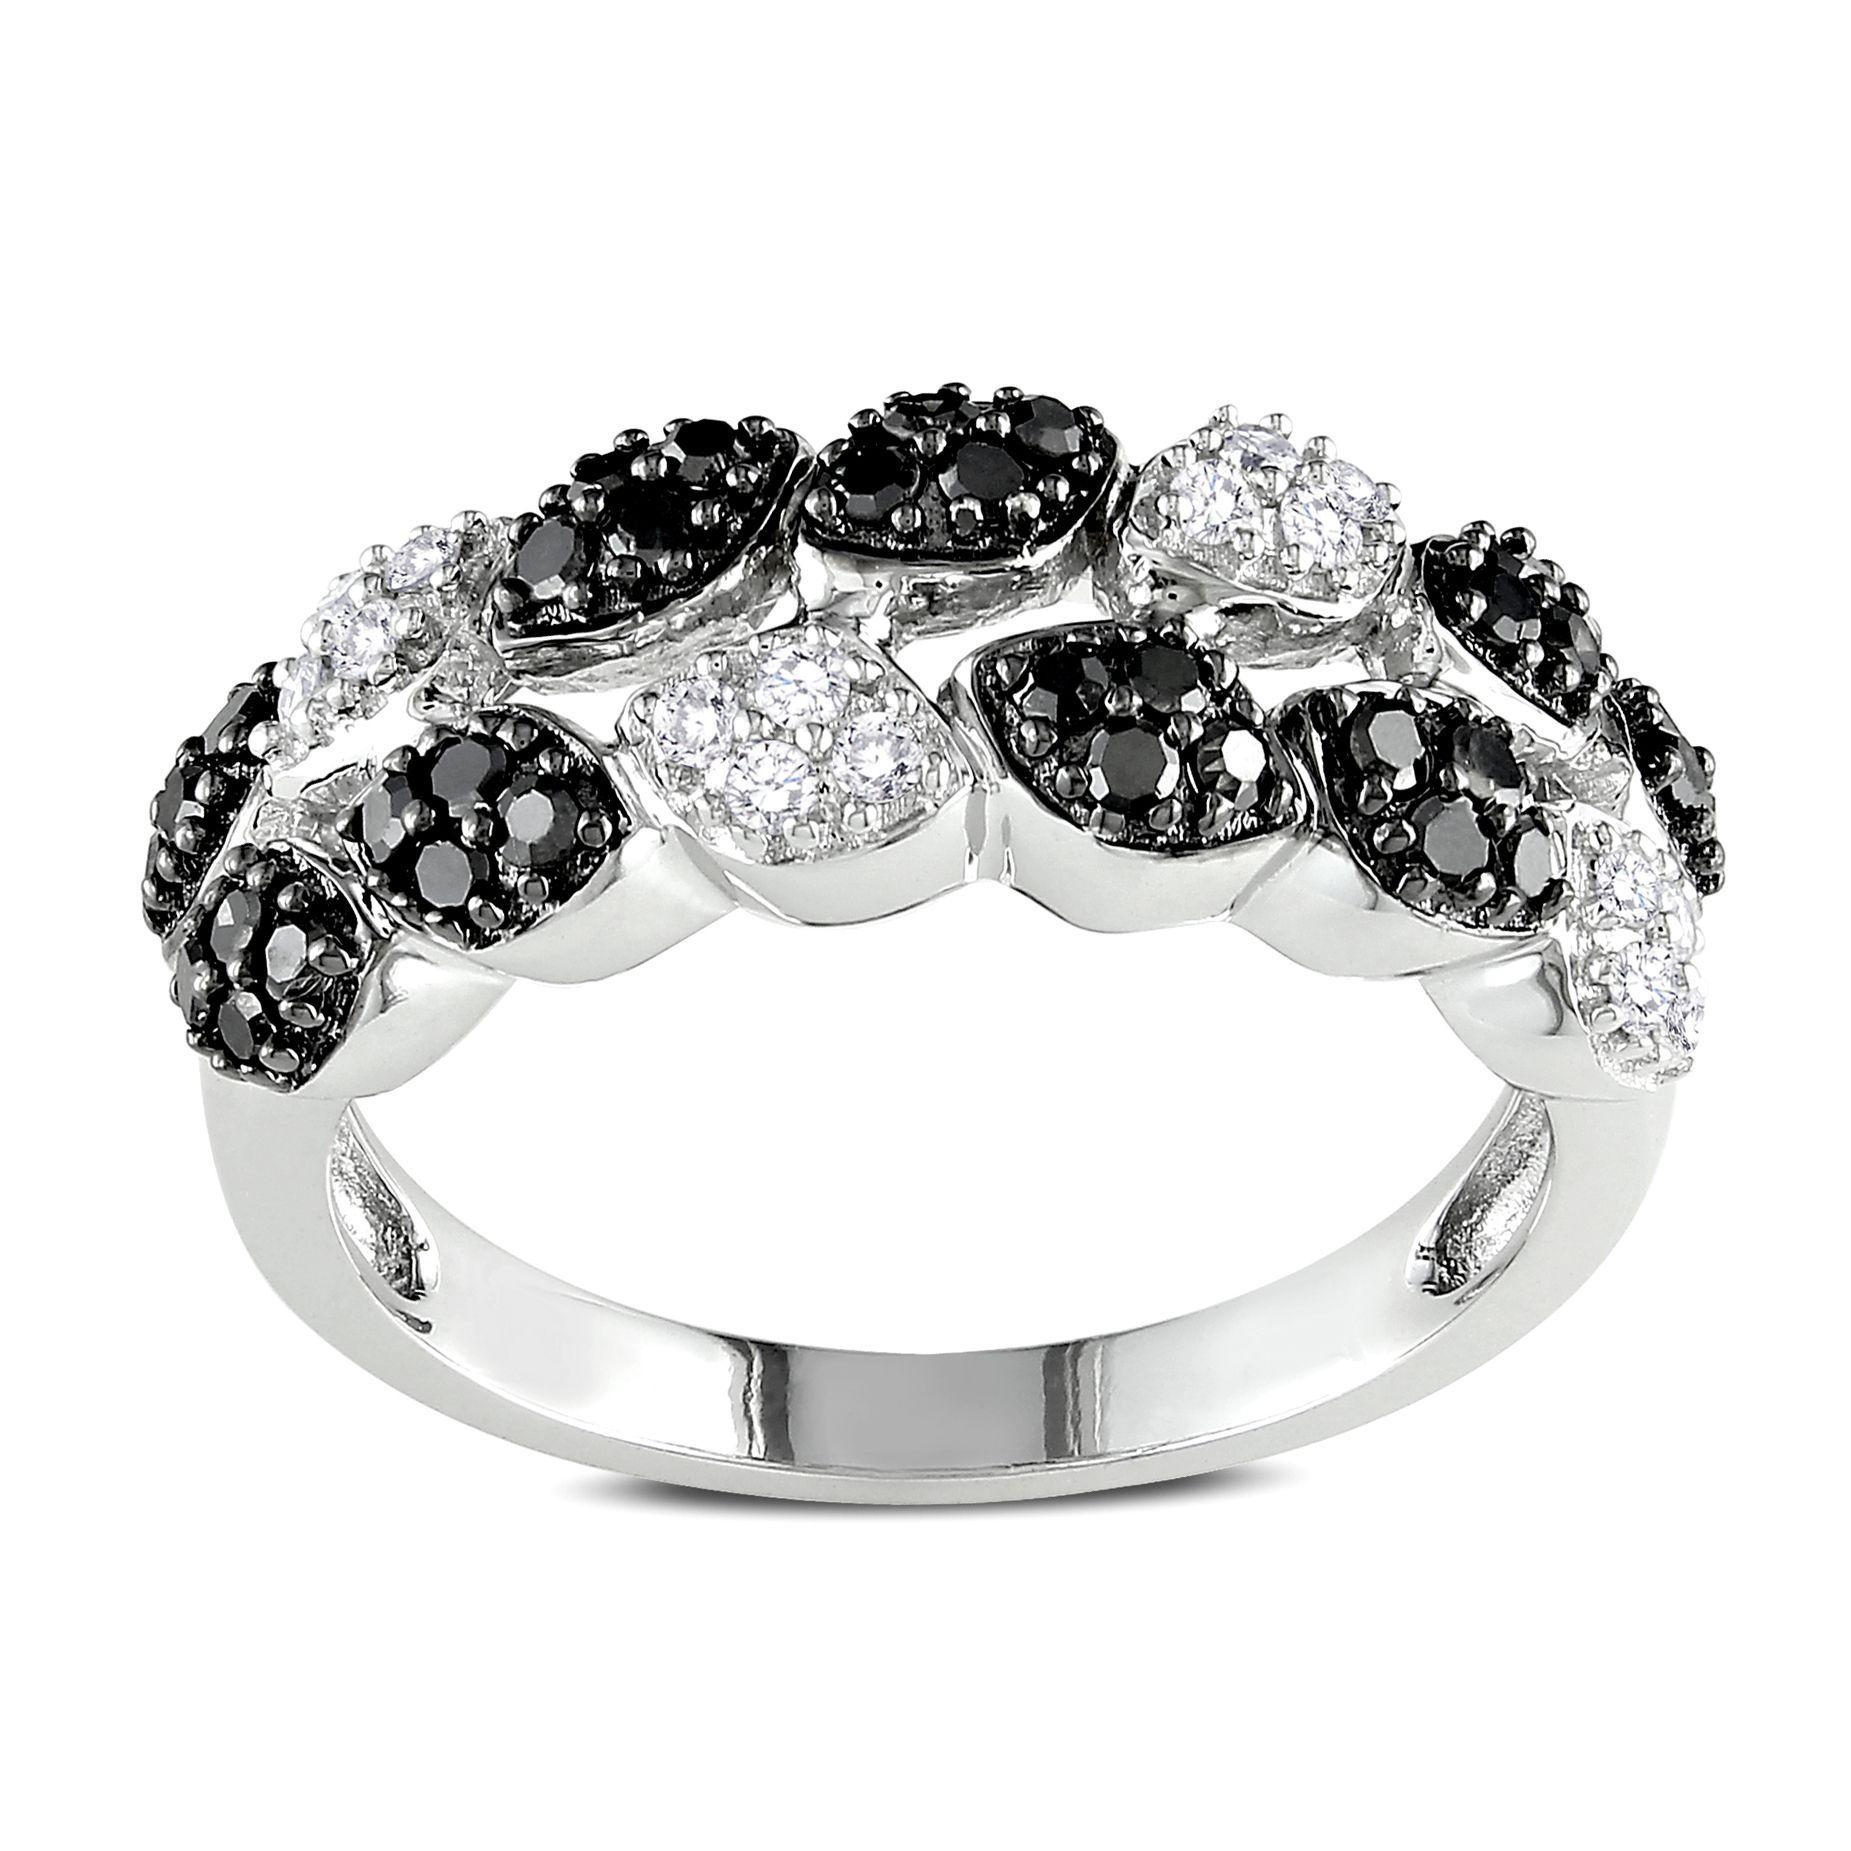 Miadora signature collection 14k white gold 1ct tdw diamond double row - Miadora 14k White Gold 1 2ct Tdw Black And White Diamond 2 Row Ring